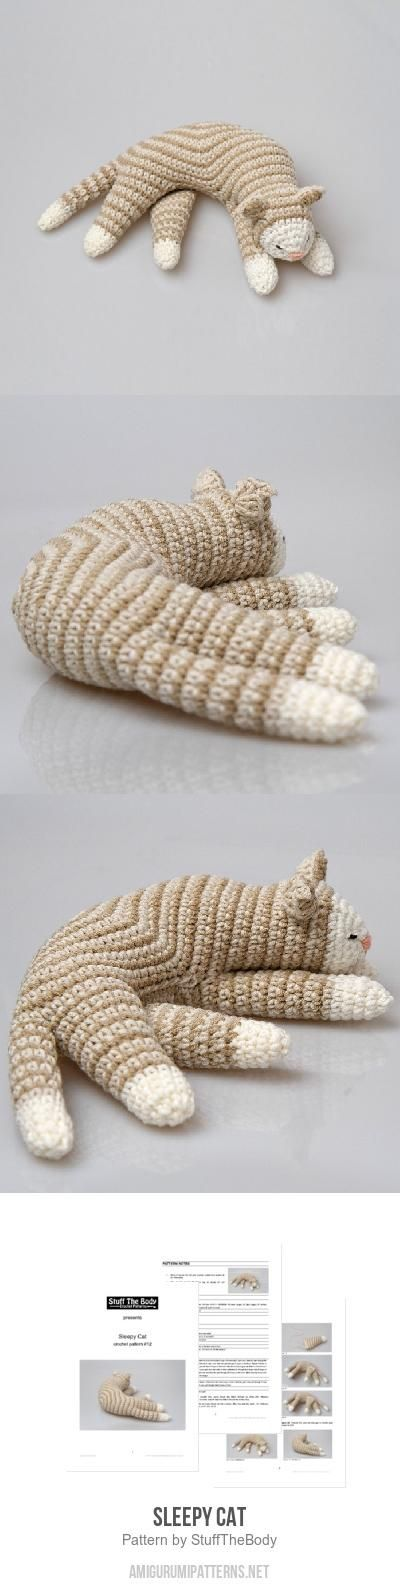 Sleepy Cat amigurumi pattern | Crochet | Croché, Tejidos y Muñecas